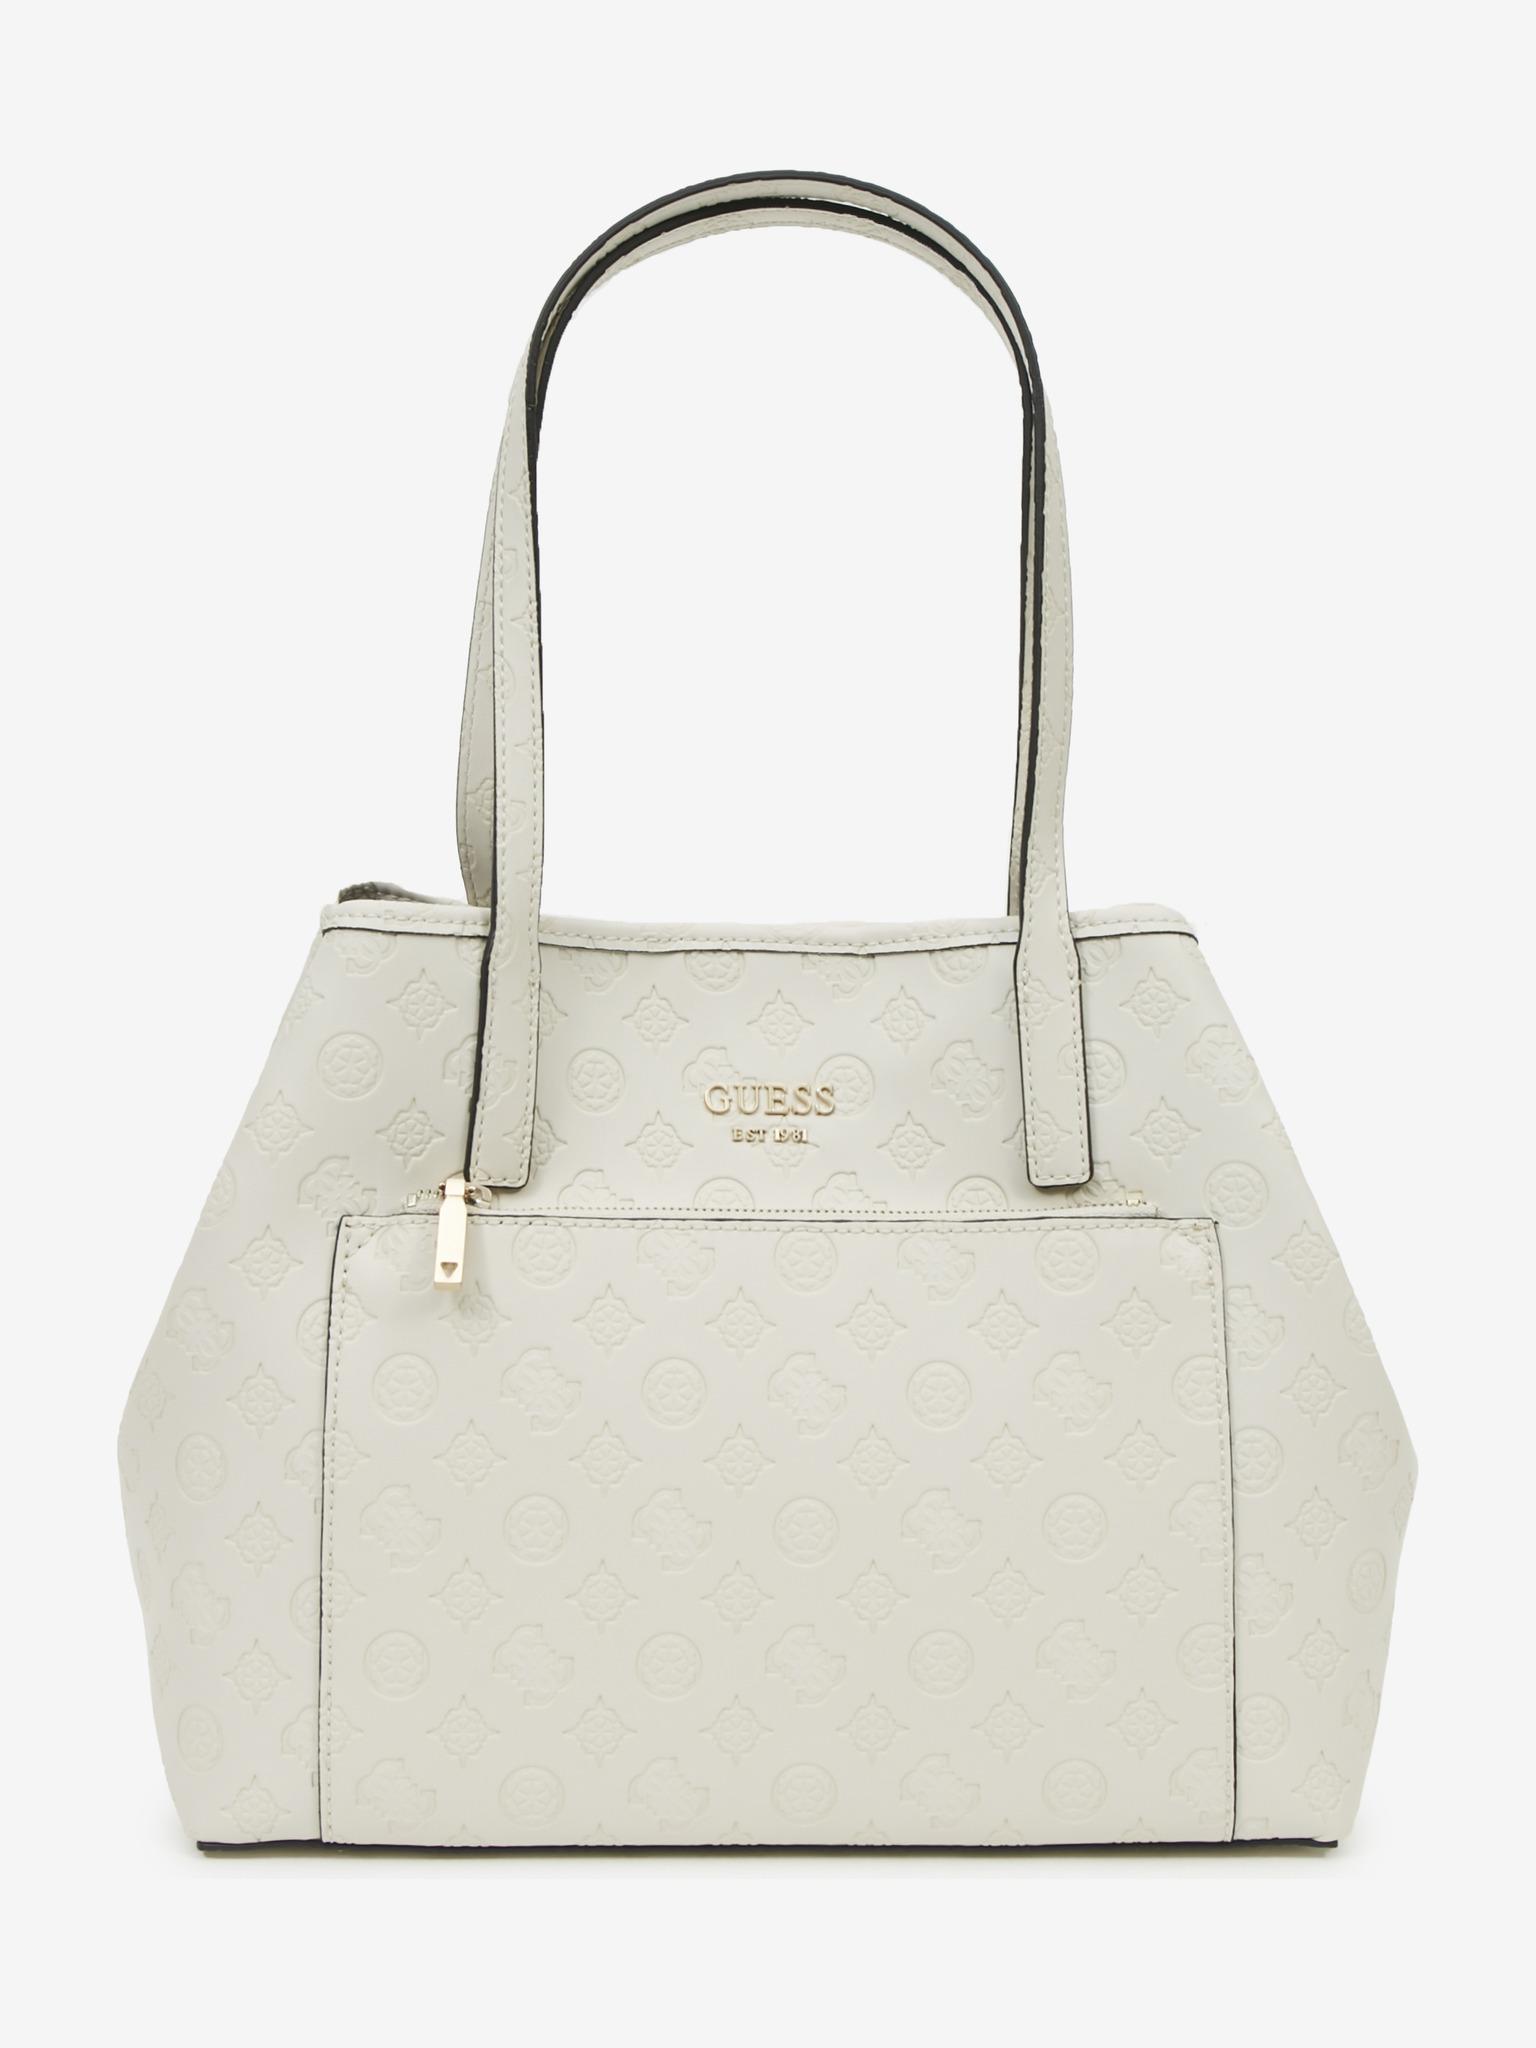 Guess white handbag Vikky Roo